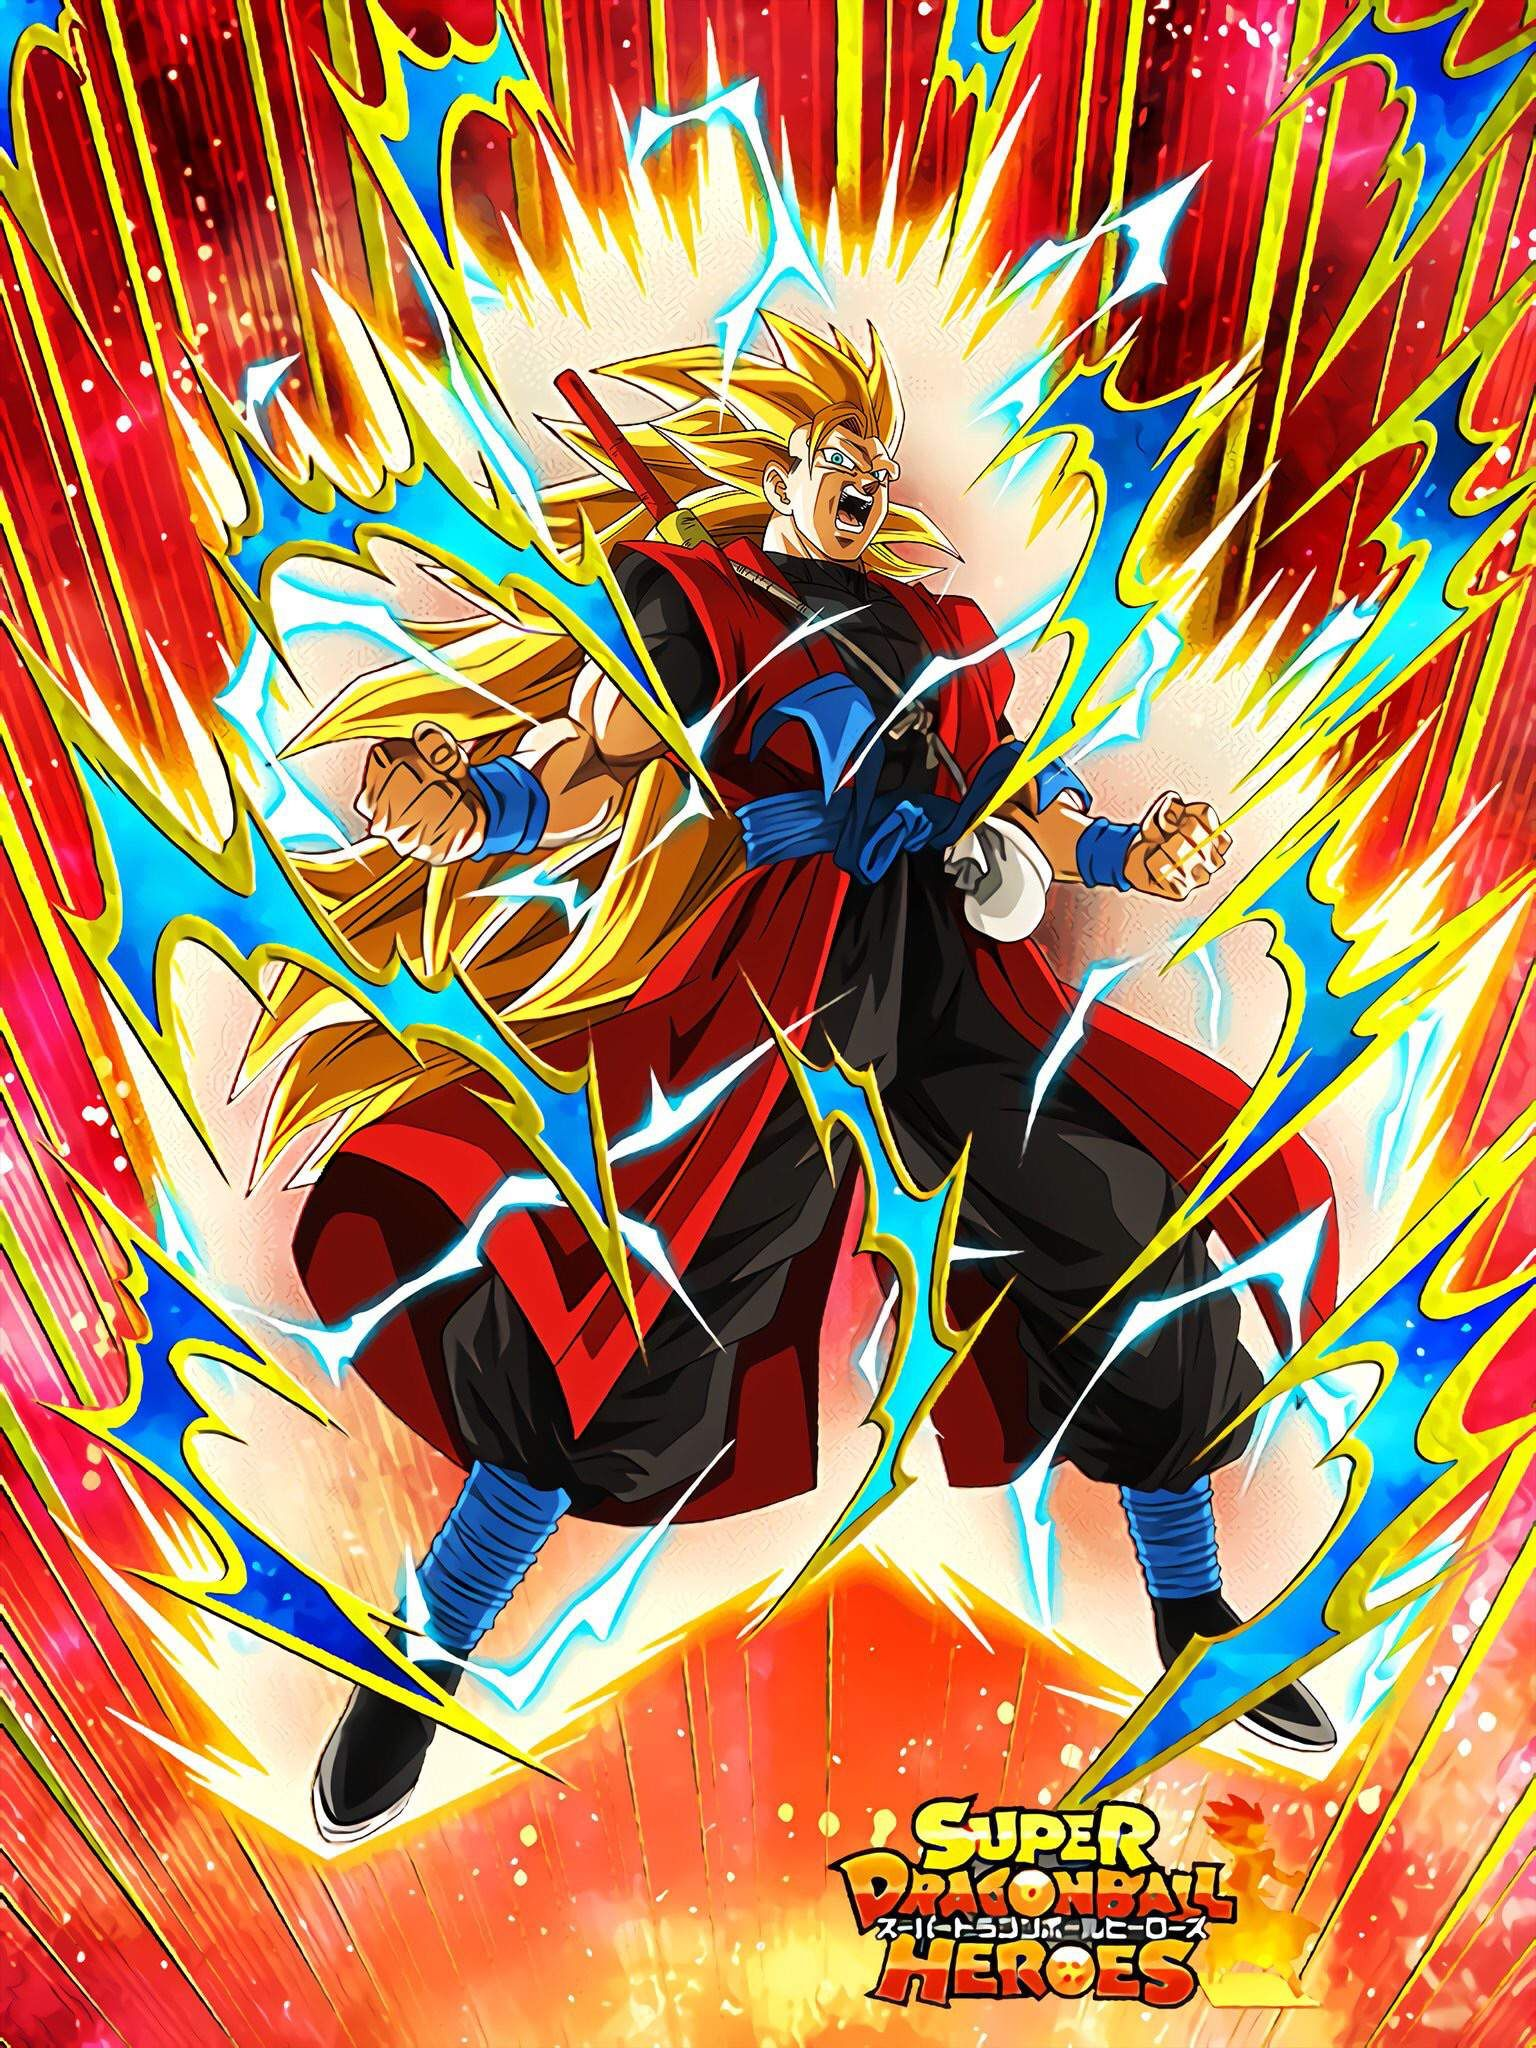 Super Saiyan 3 Goku Xeno Super Warrior Of Another Dimension Leader Skill Super Str Anime Dragon Ball Super Dragon Ball Artwork Dragon Ball Super Wallpapers